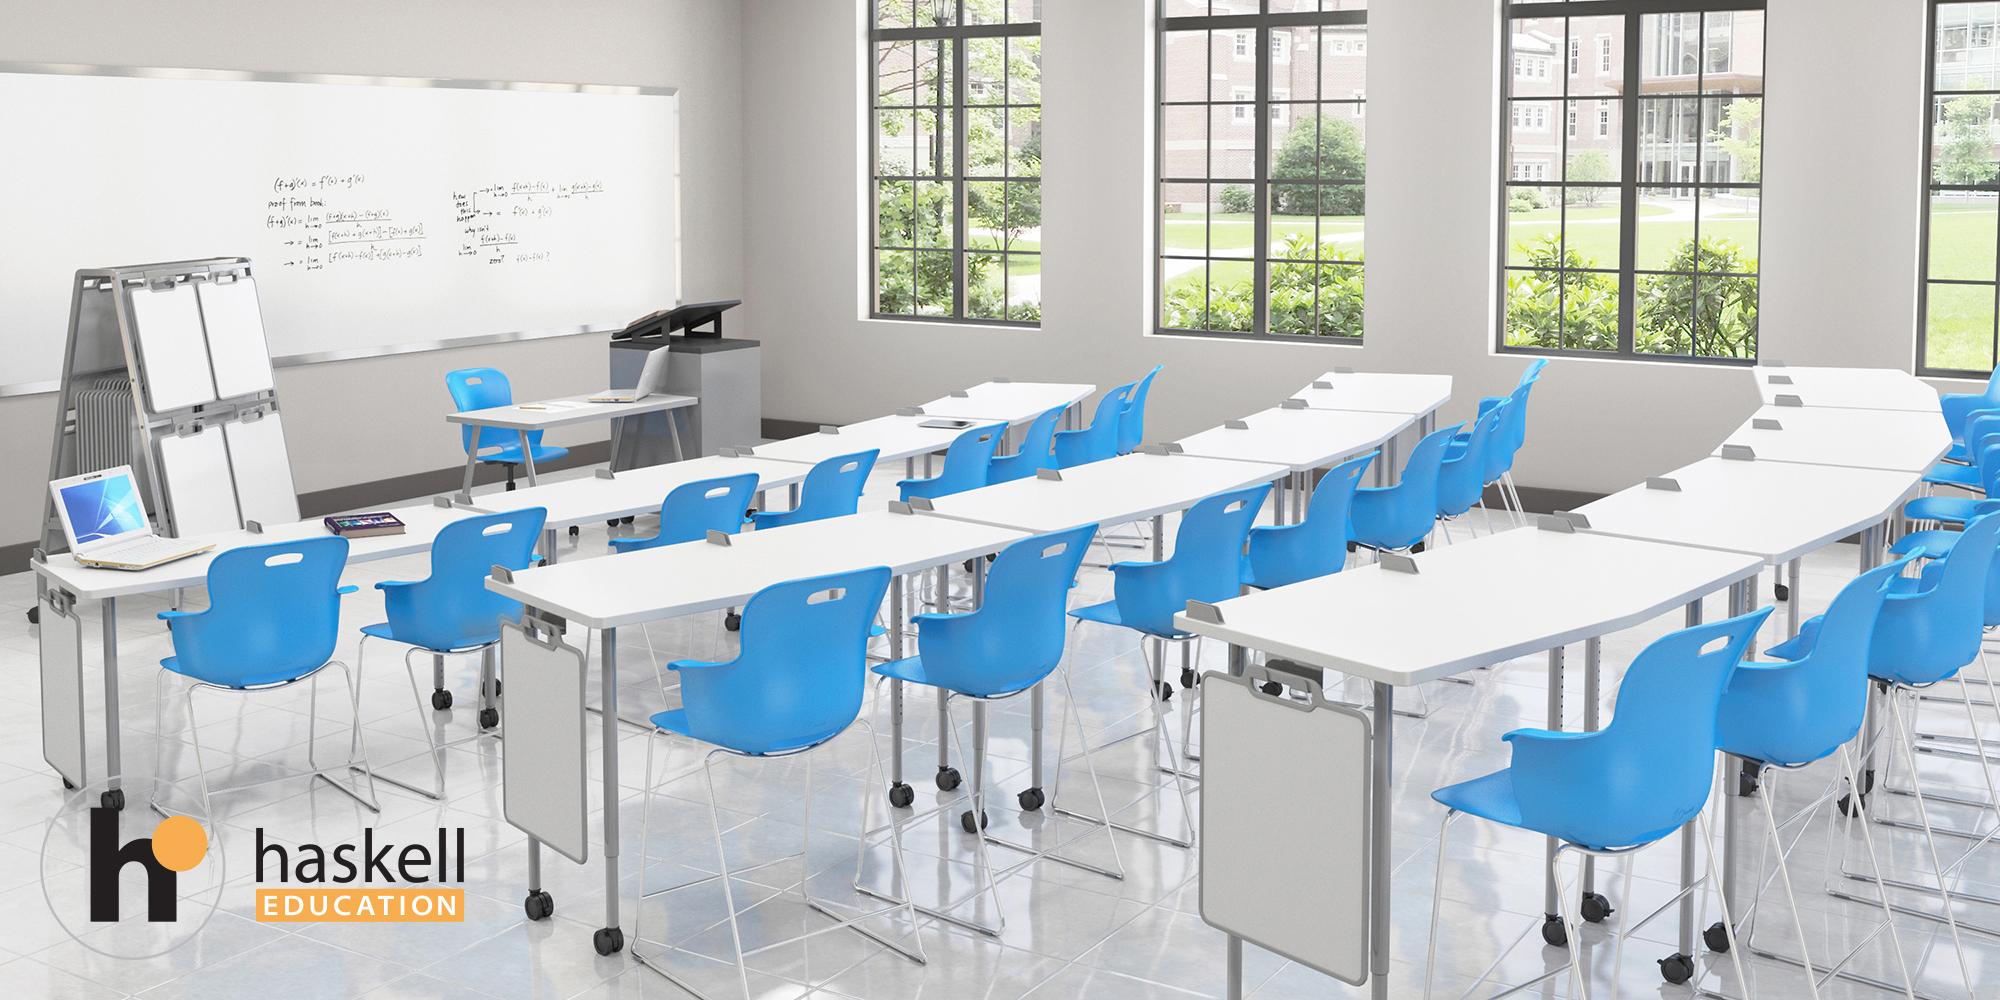 Stadium Seating Classroom SLED AngleShot